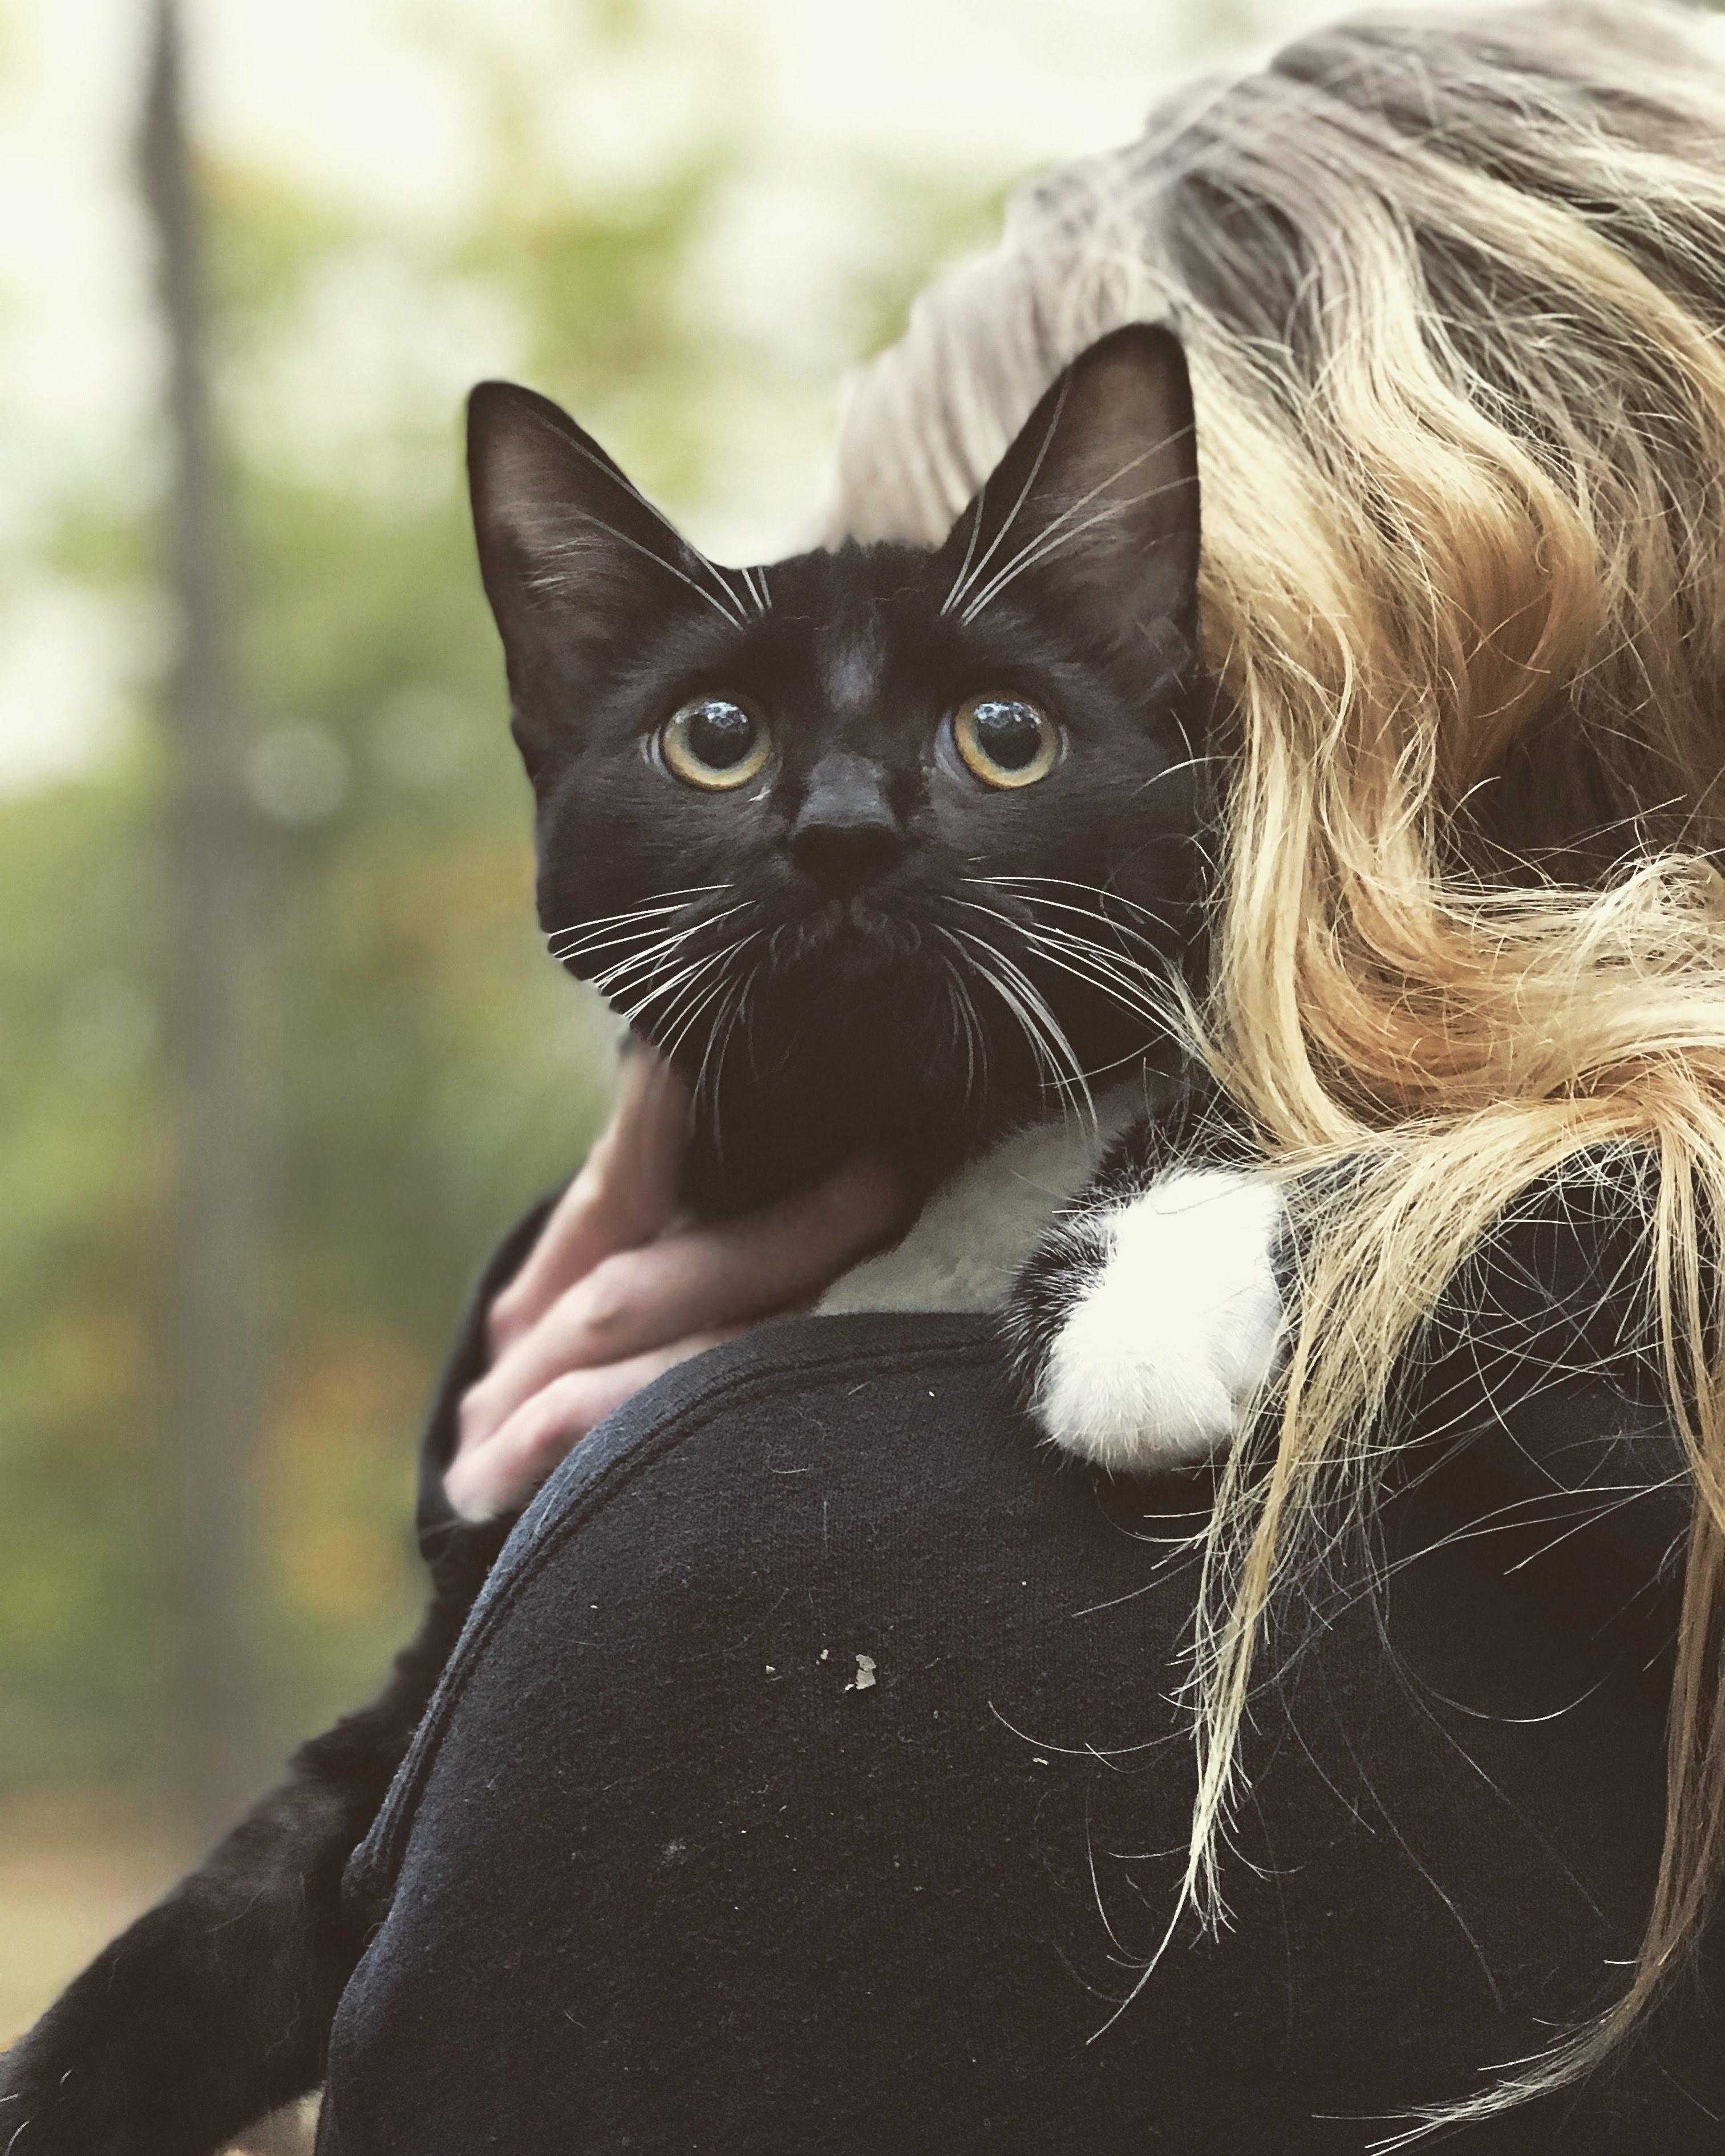 Sheba My Familiar Named For Her Majesty Cat Having Kittens Cat Fleas Bicolor Cat